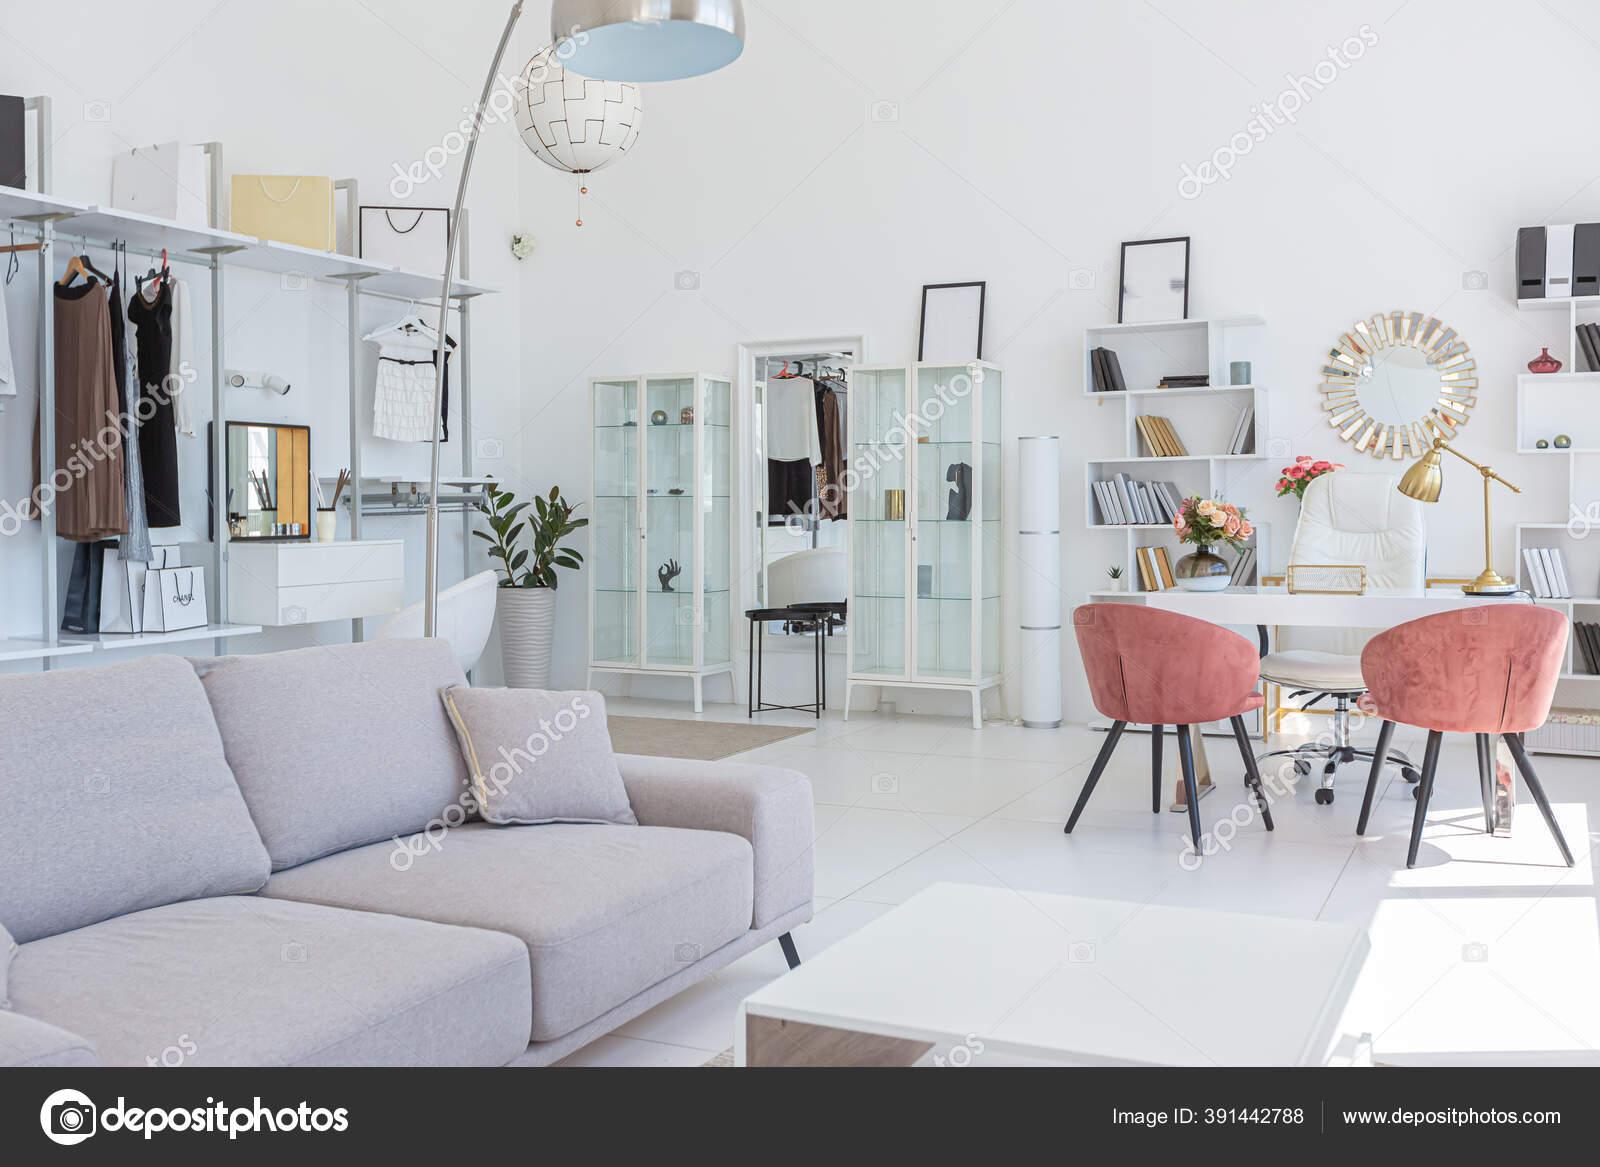 Cozy Luxury Modern Interior Design Studio Apartment Extra White Colors Stock Photo C Nokia Alexnet 391442788